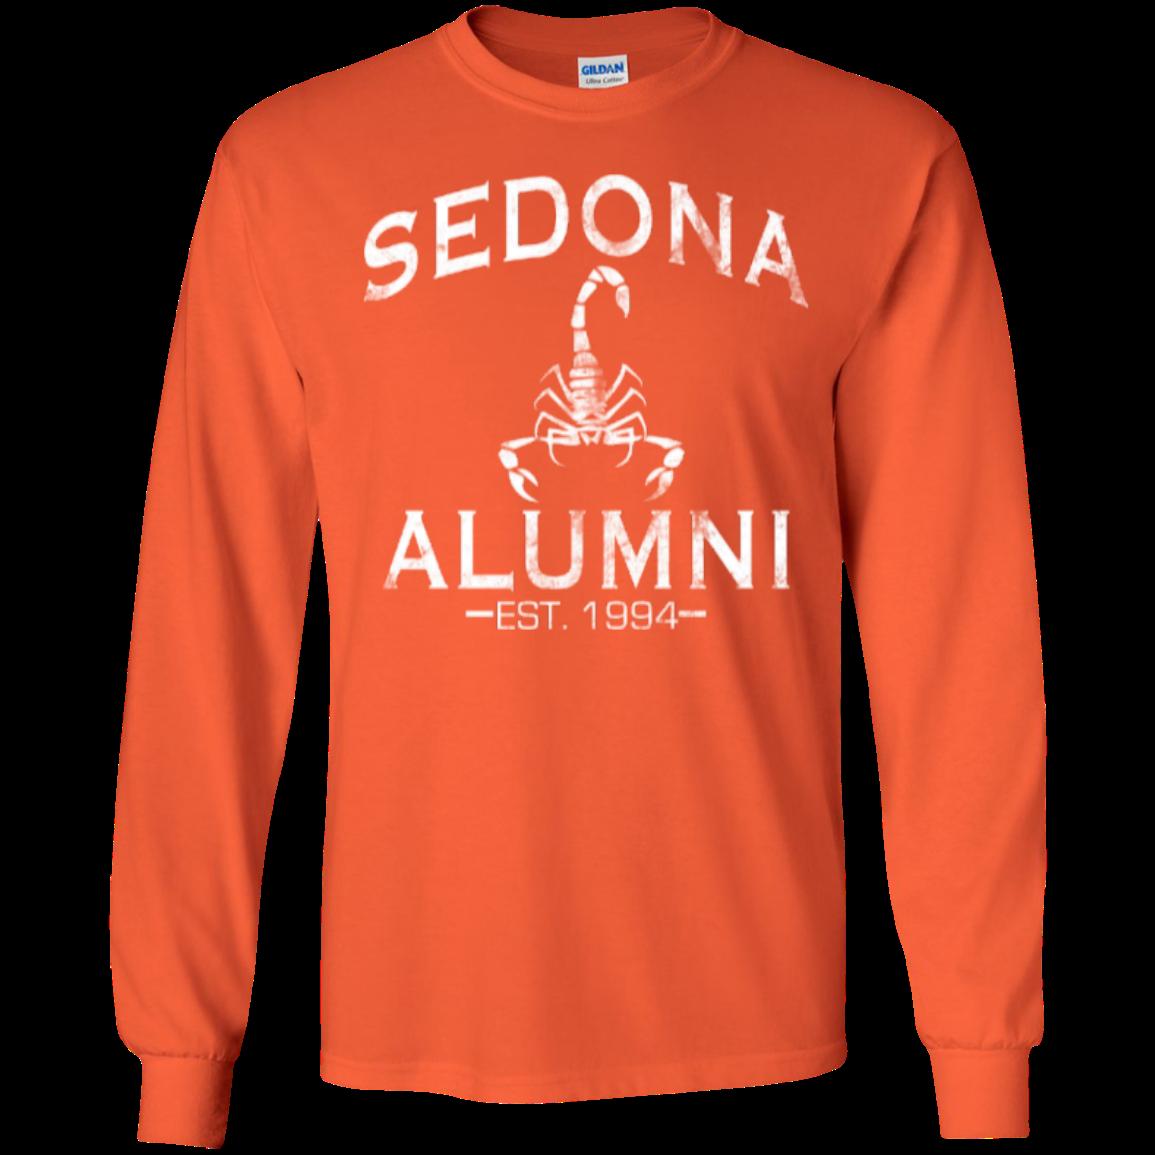 Sedona Alumni | Long Sleeve Ultra Cotton T-Shirt